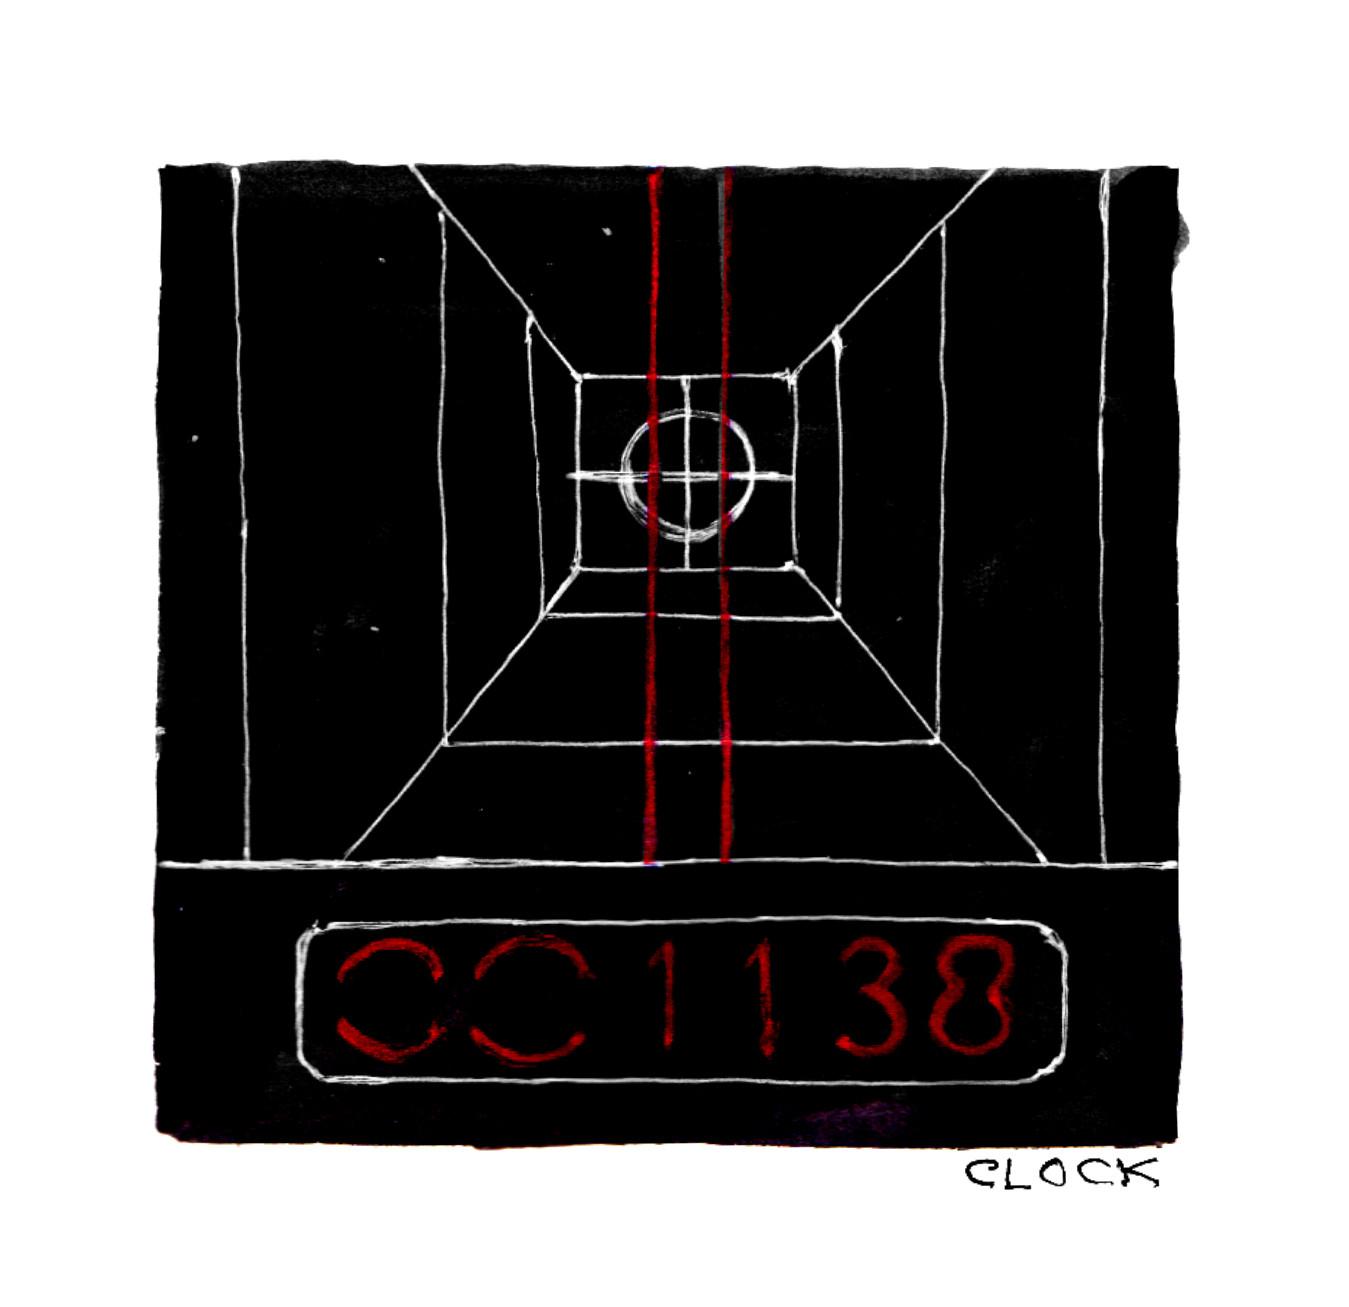 Midhat kapetanovic 14 clock